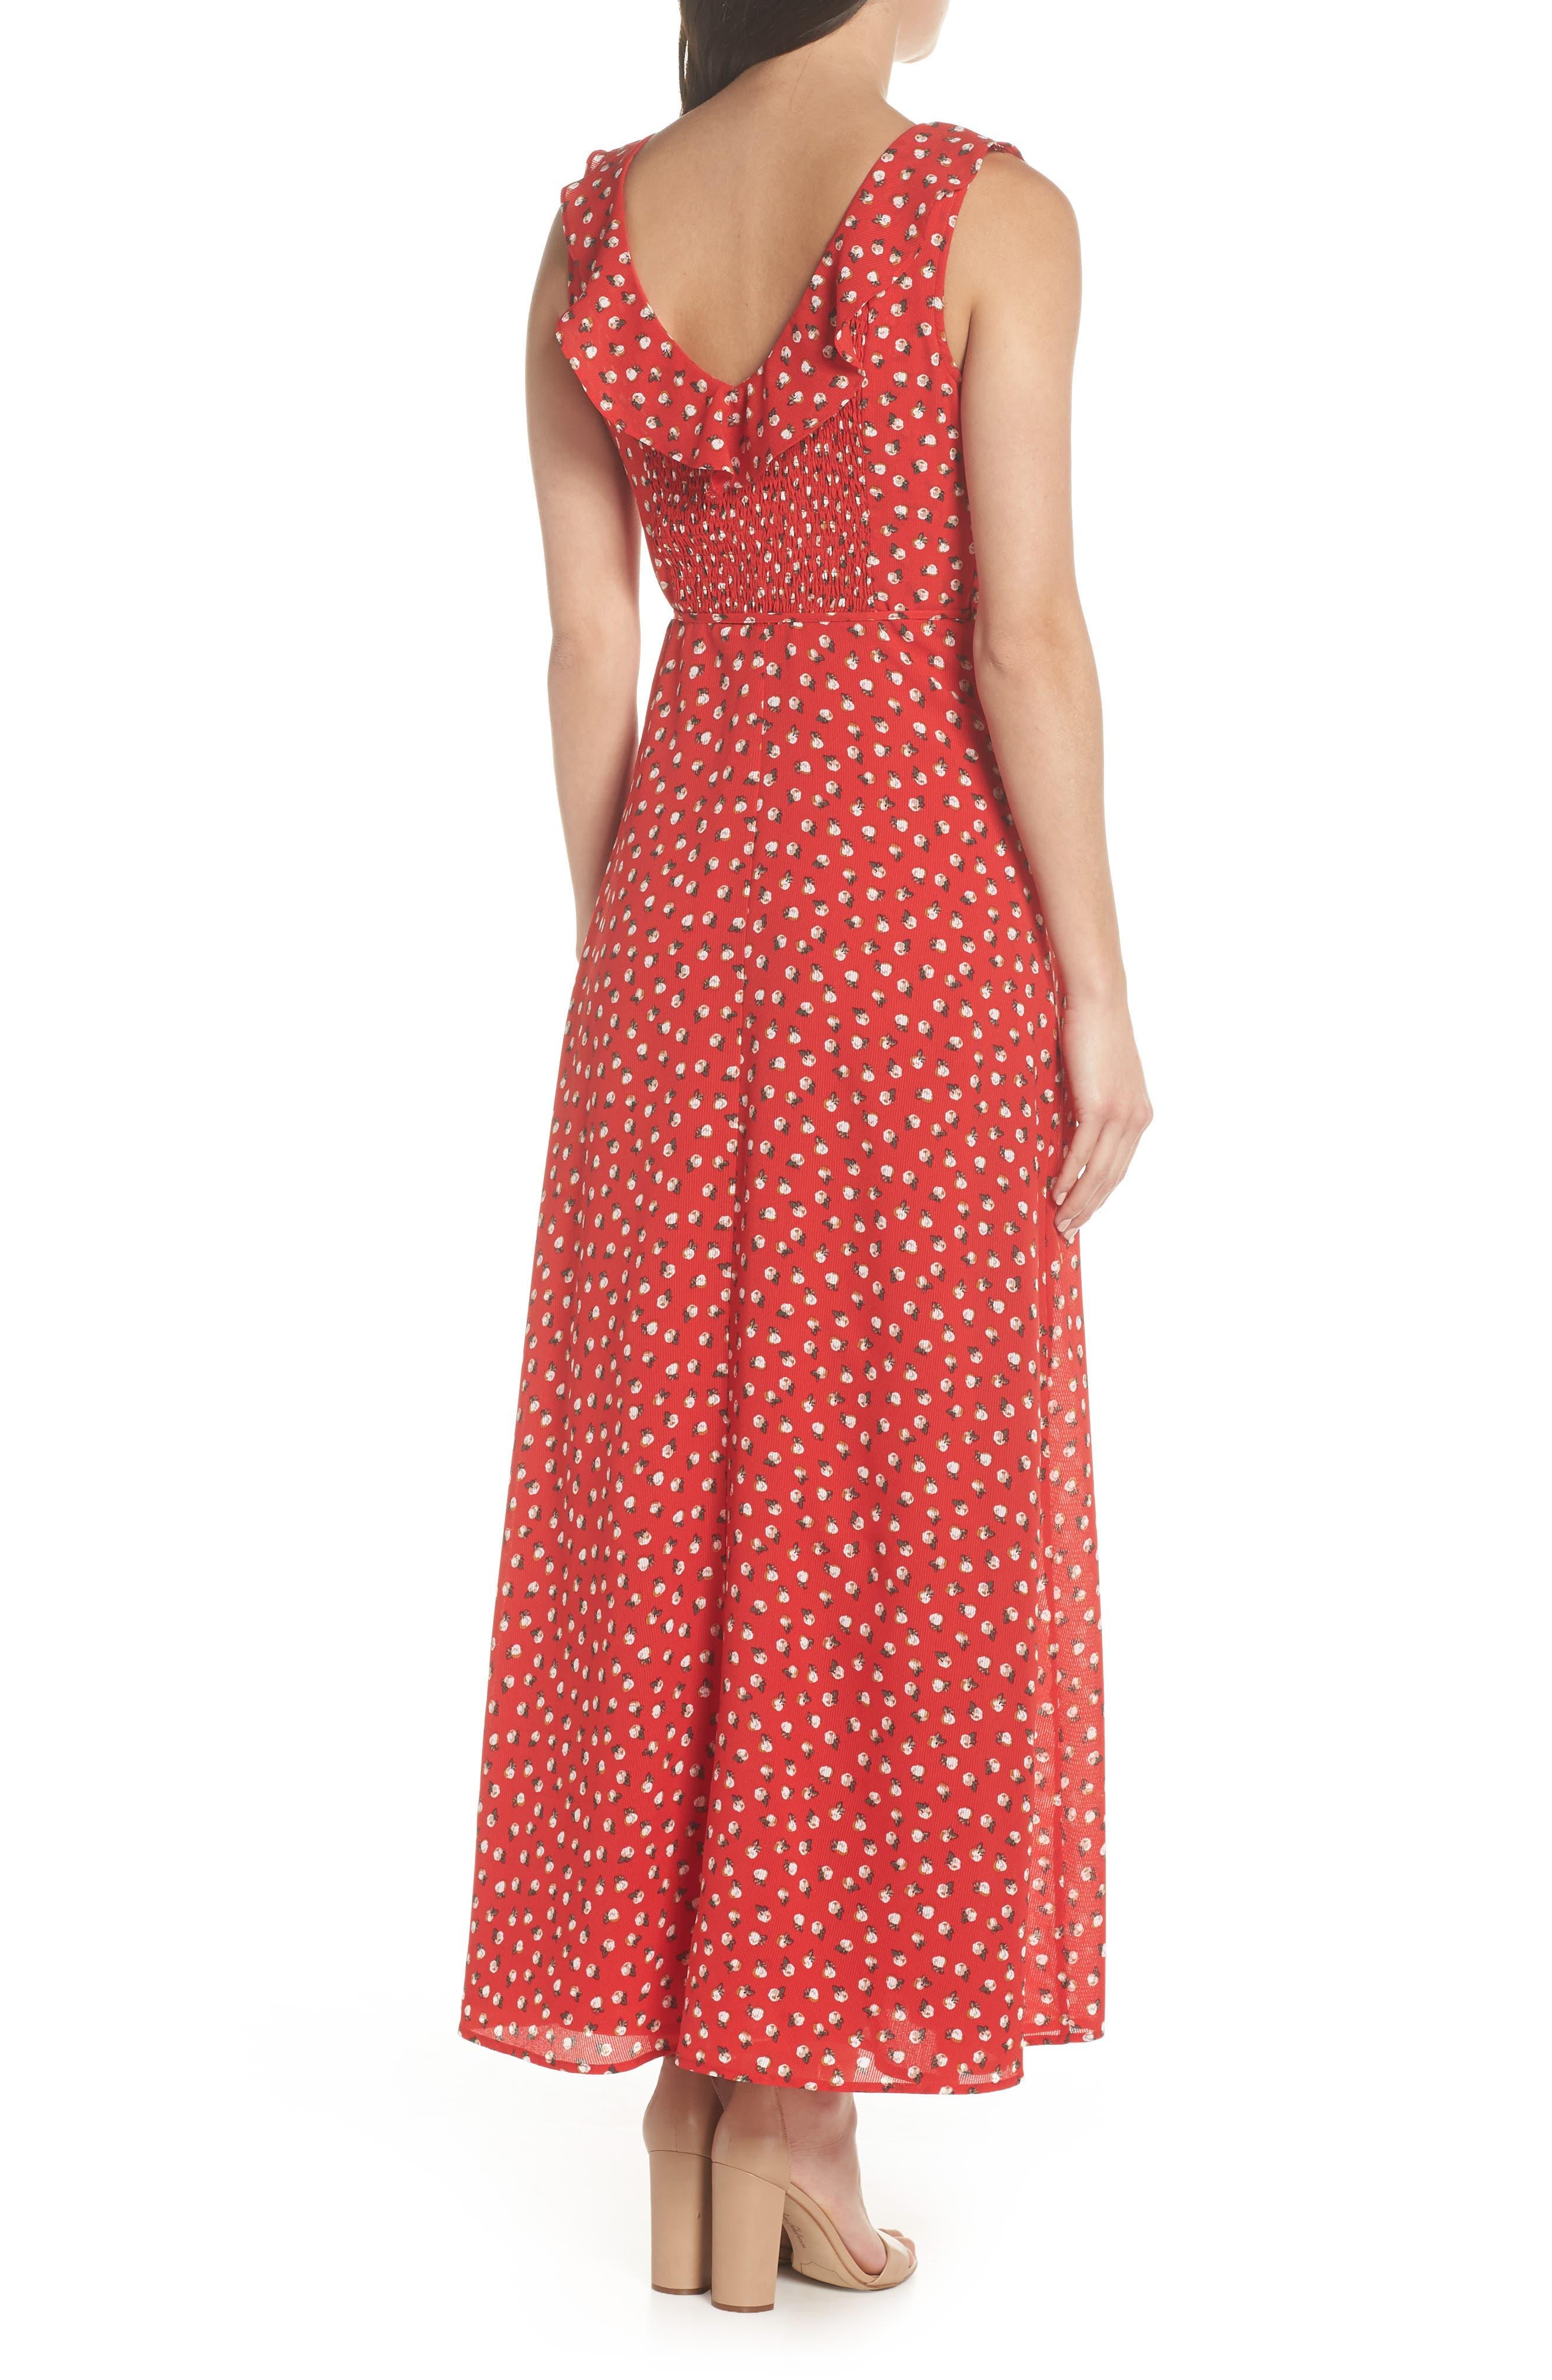 Nora Maxi Dress,                             Alternate thumbnail 2, color,                             Cherry